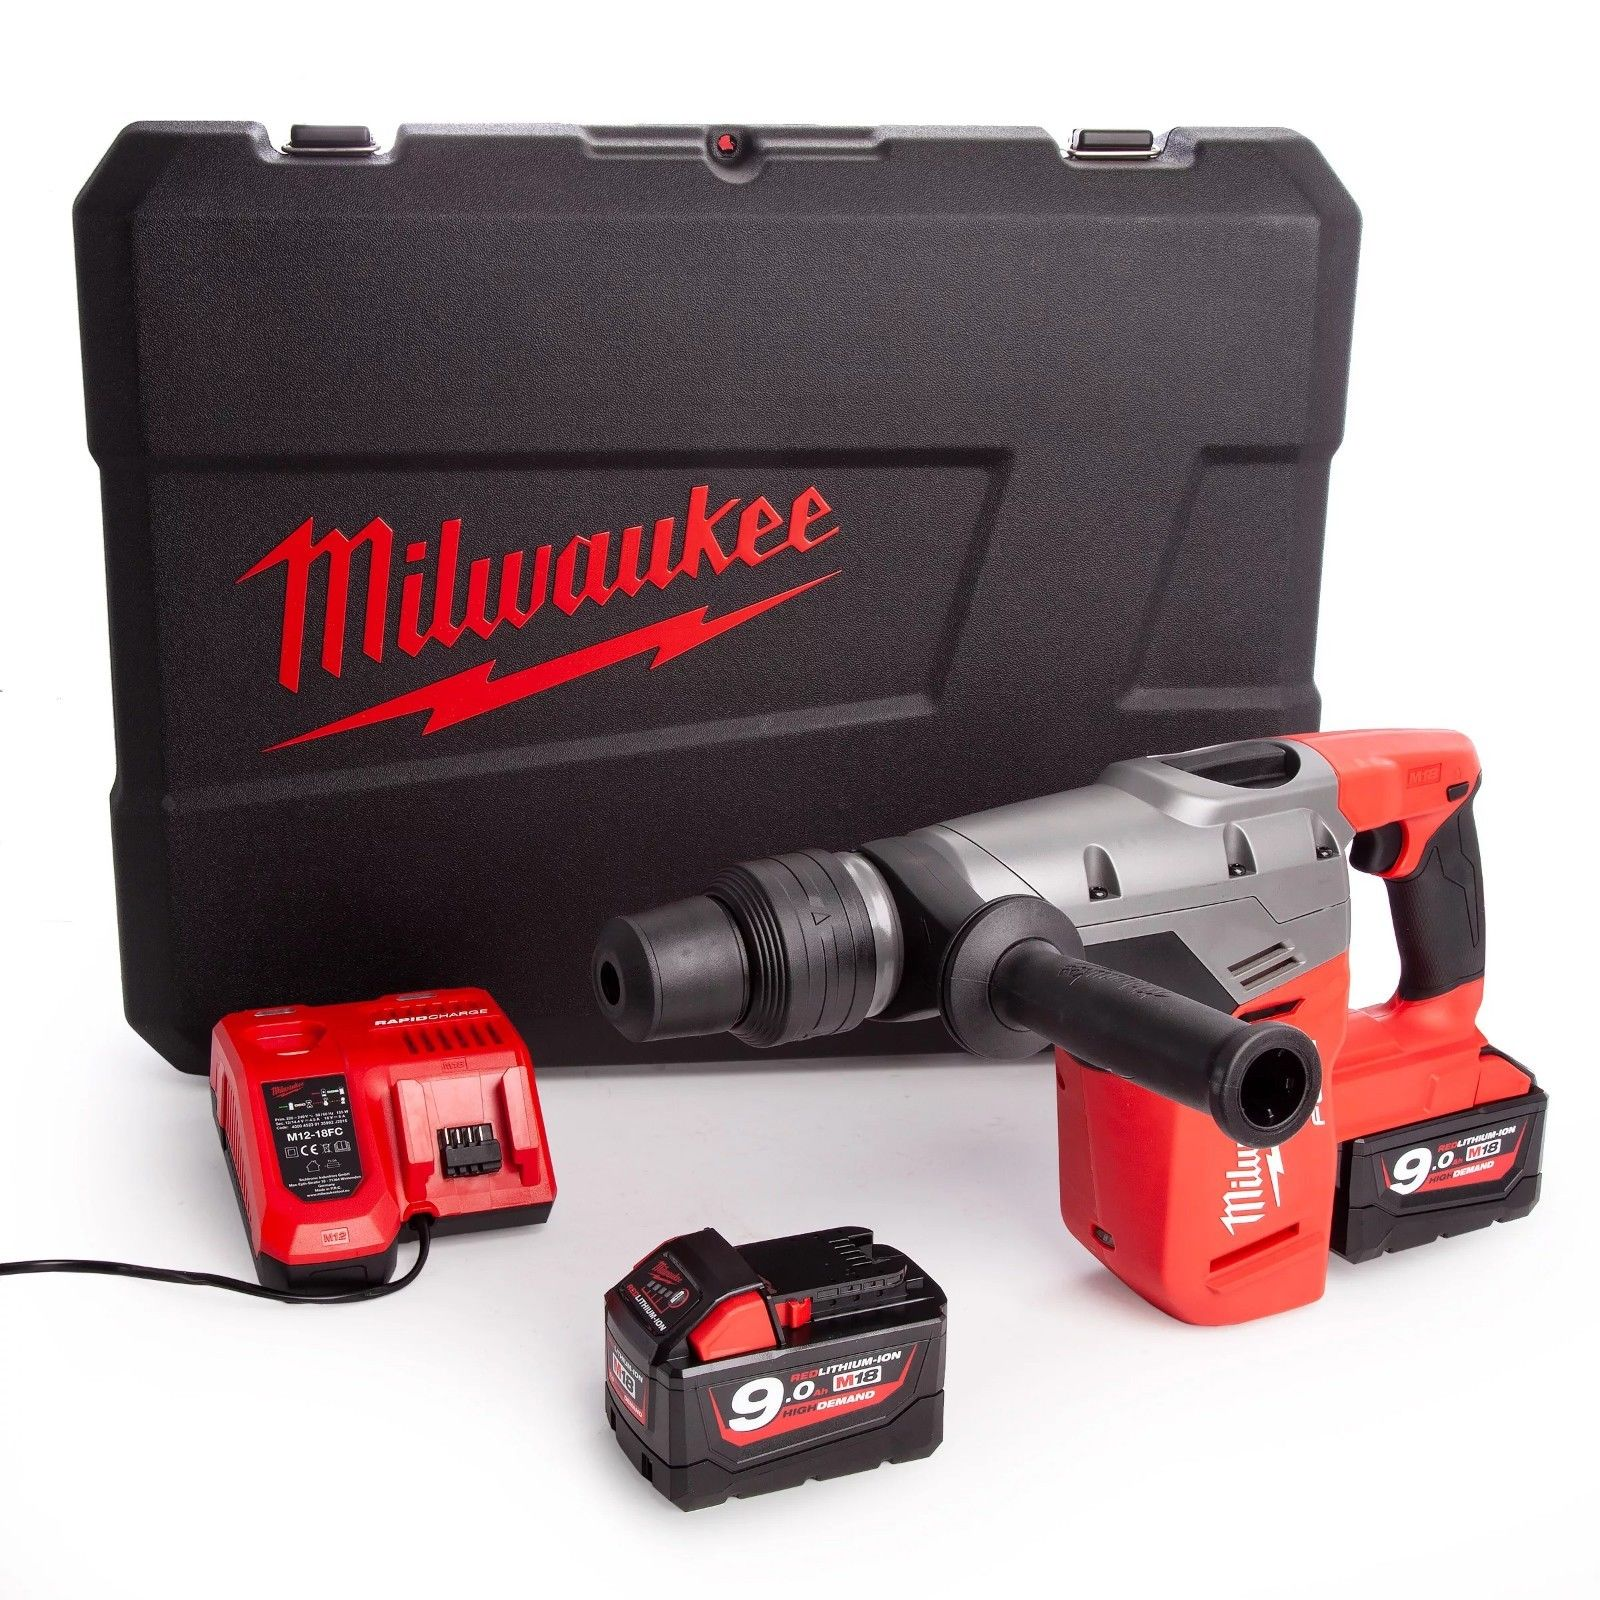 MILWAUKEE 18V FUEL BRUSHLESS SDS MAX 3-MODE HAMMER - M18CHM - 9.0AH PACK